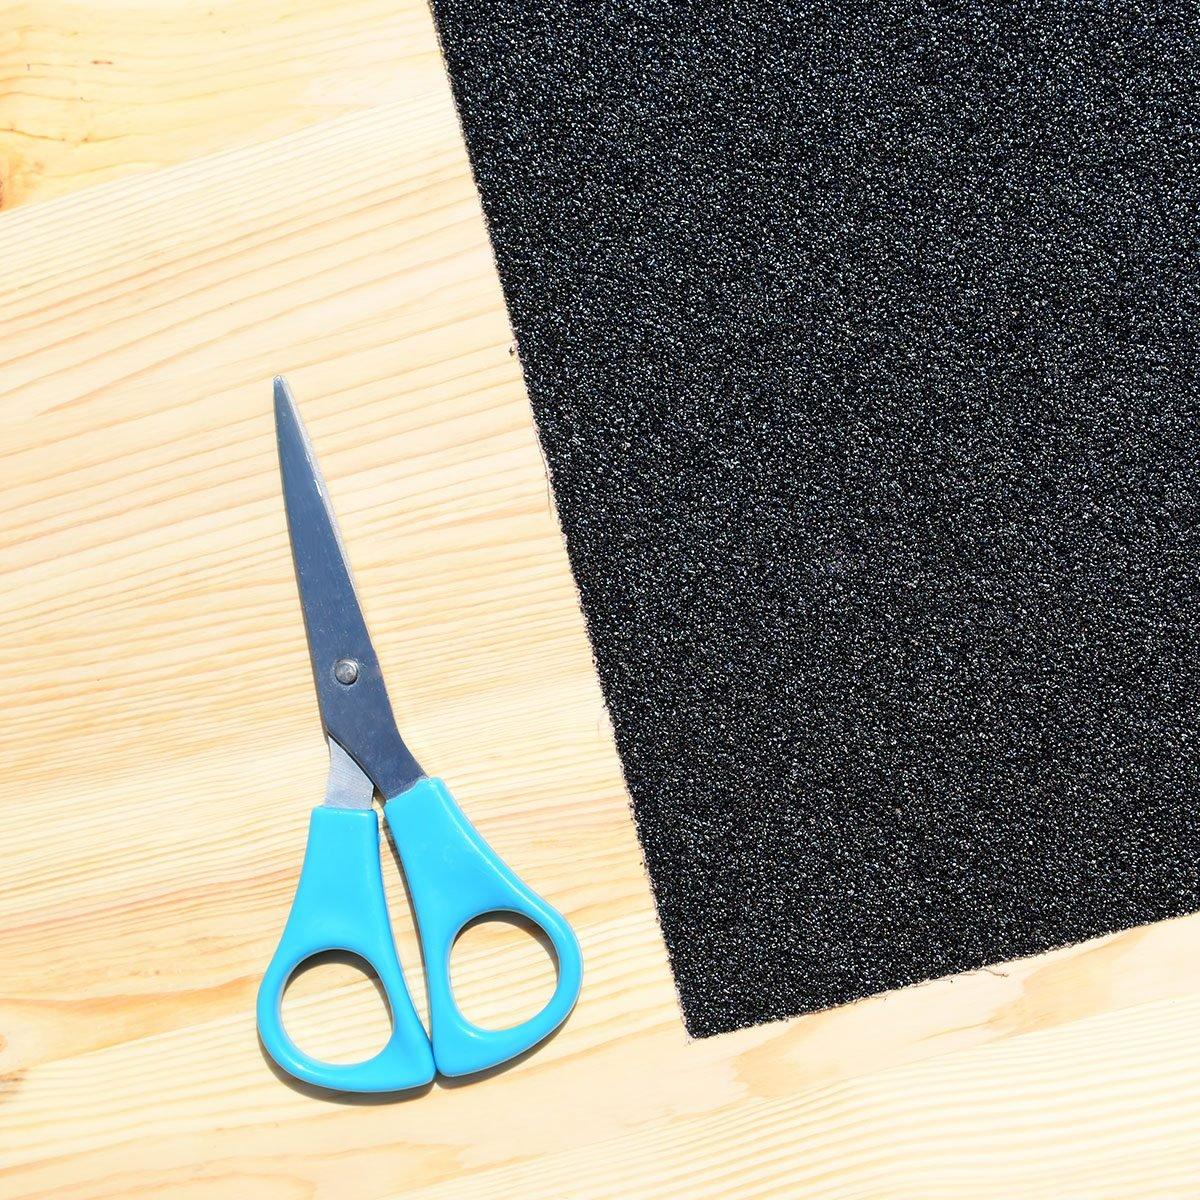 10 Surprising Ways to Use Sandpaper